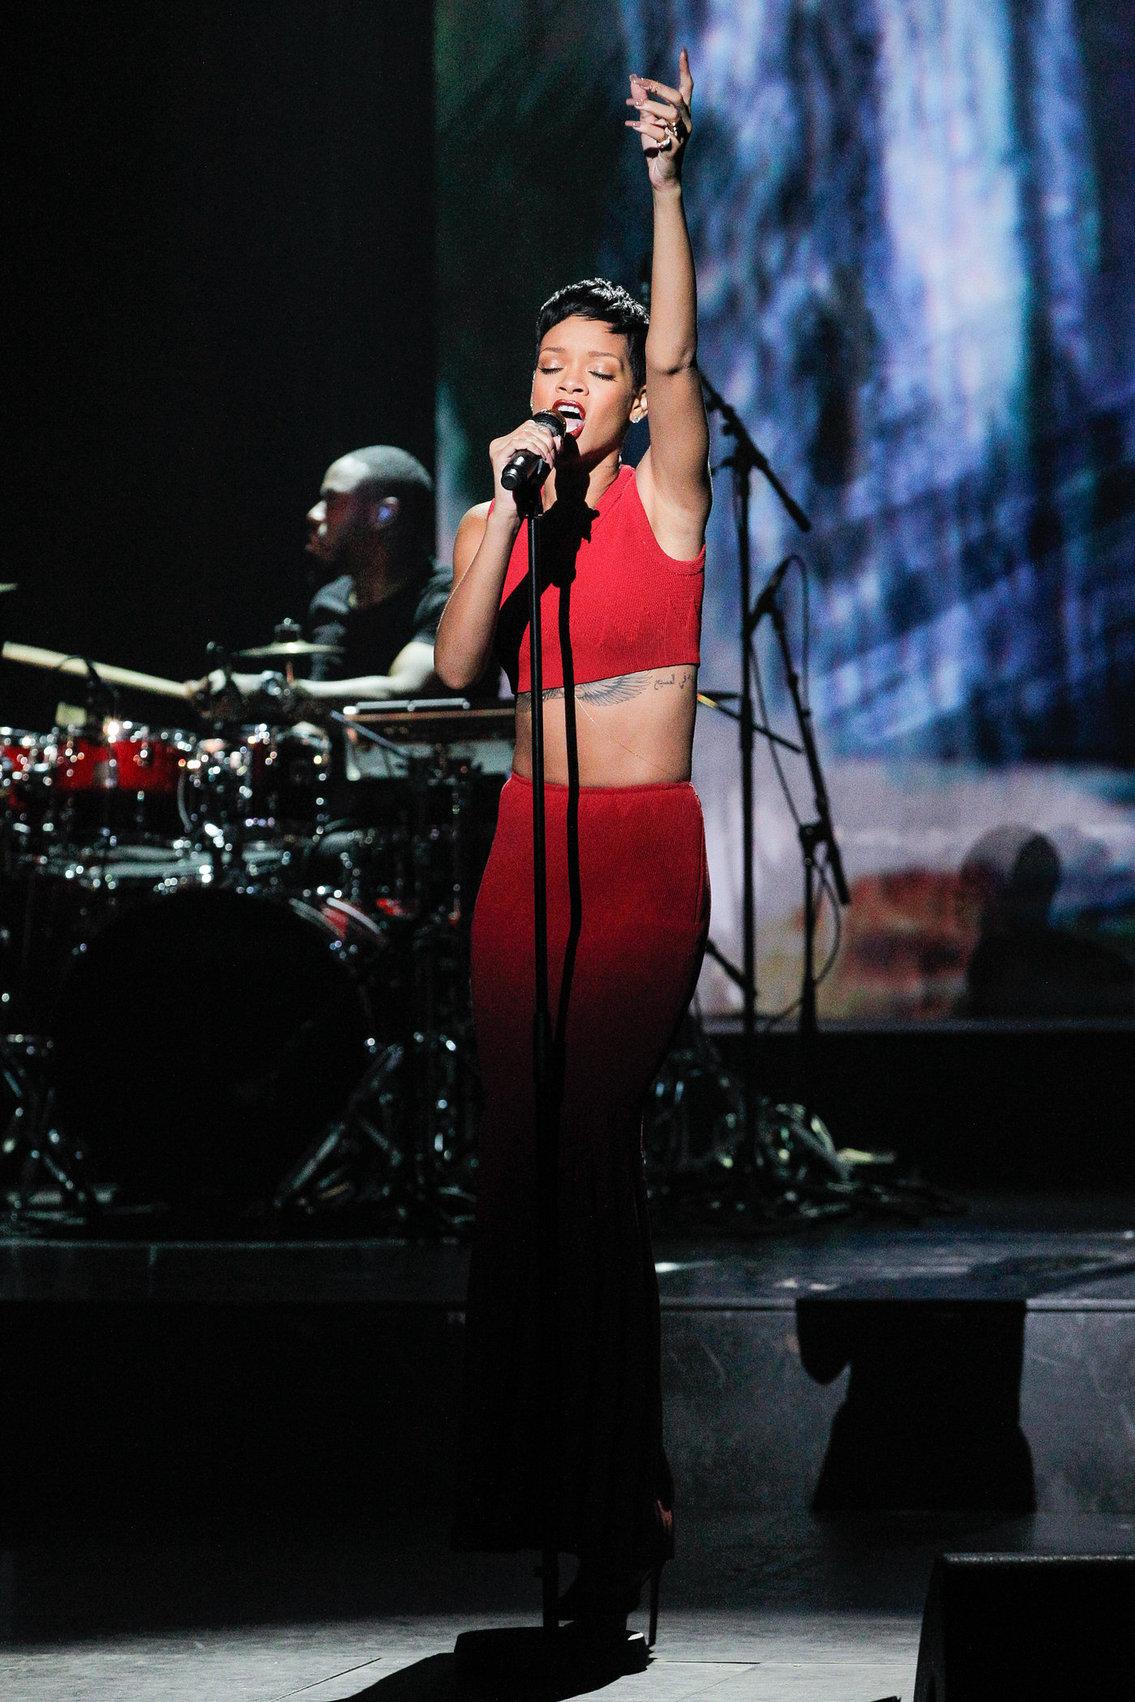 Rihanna La Chanson De L'Annee 2012 in Paris 12/11/12